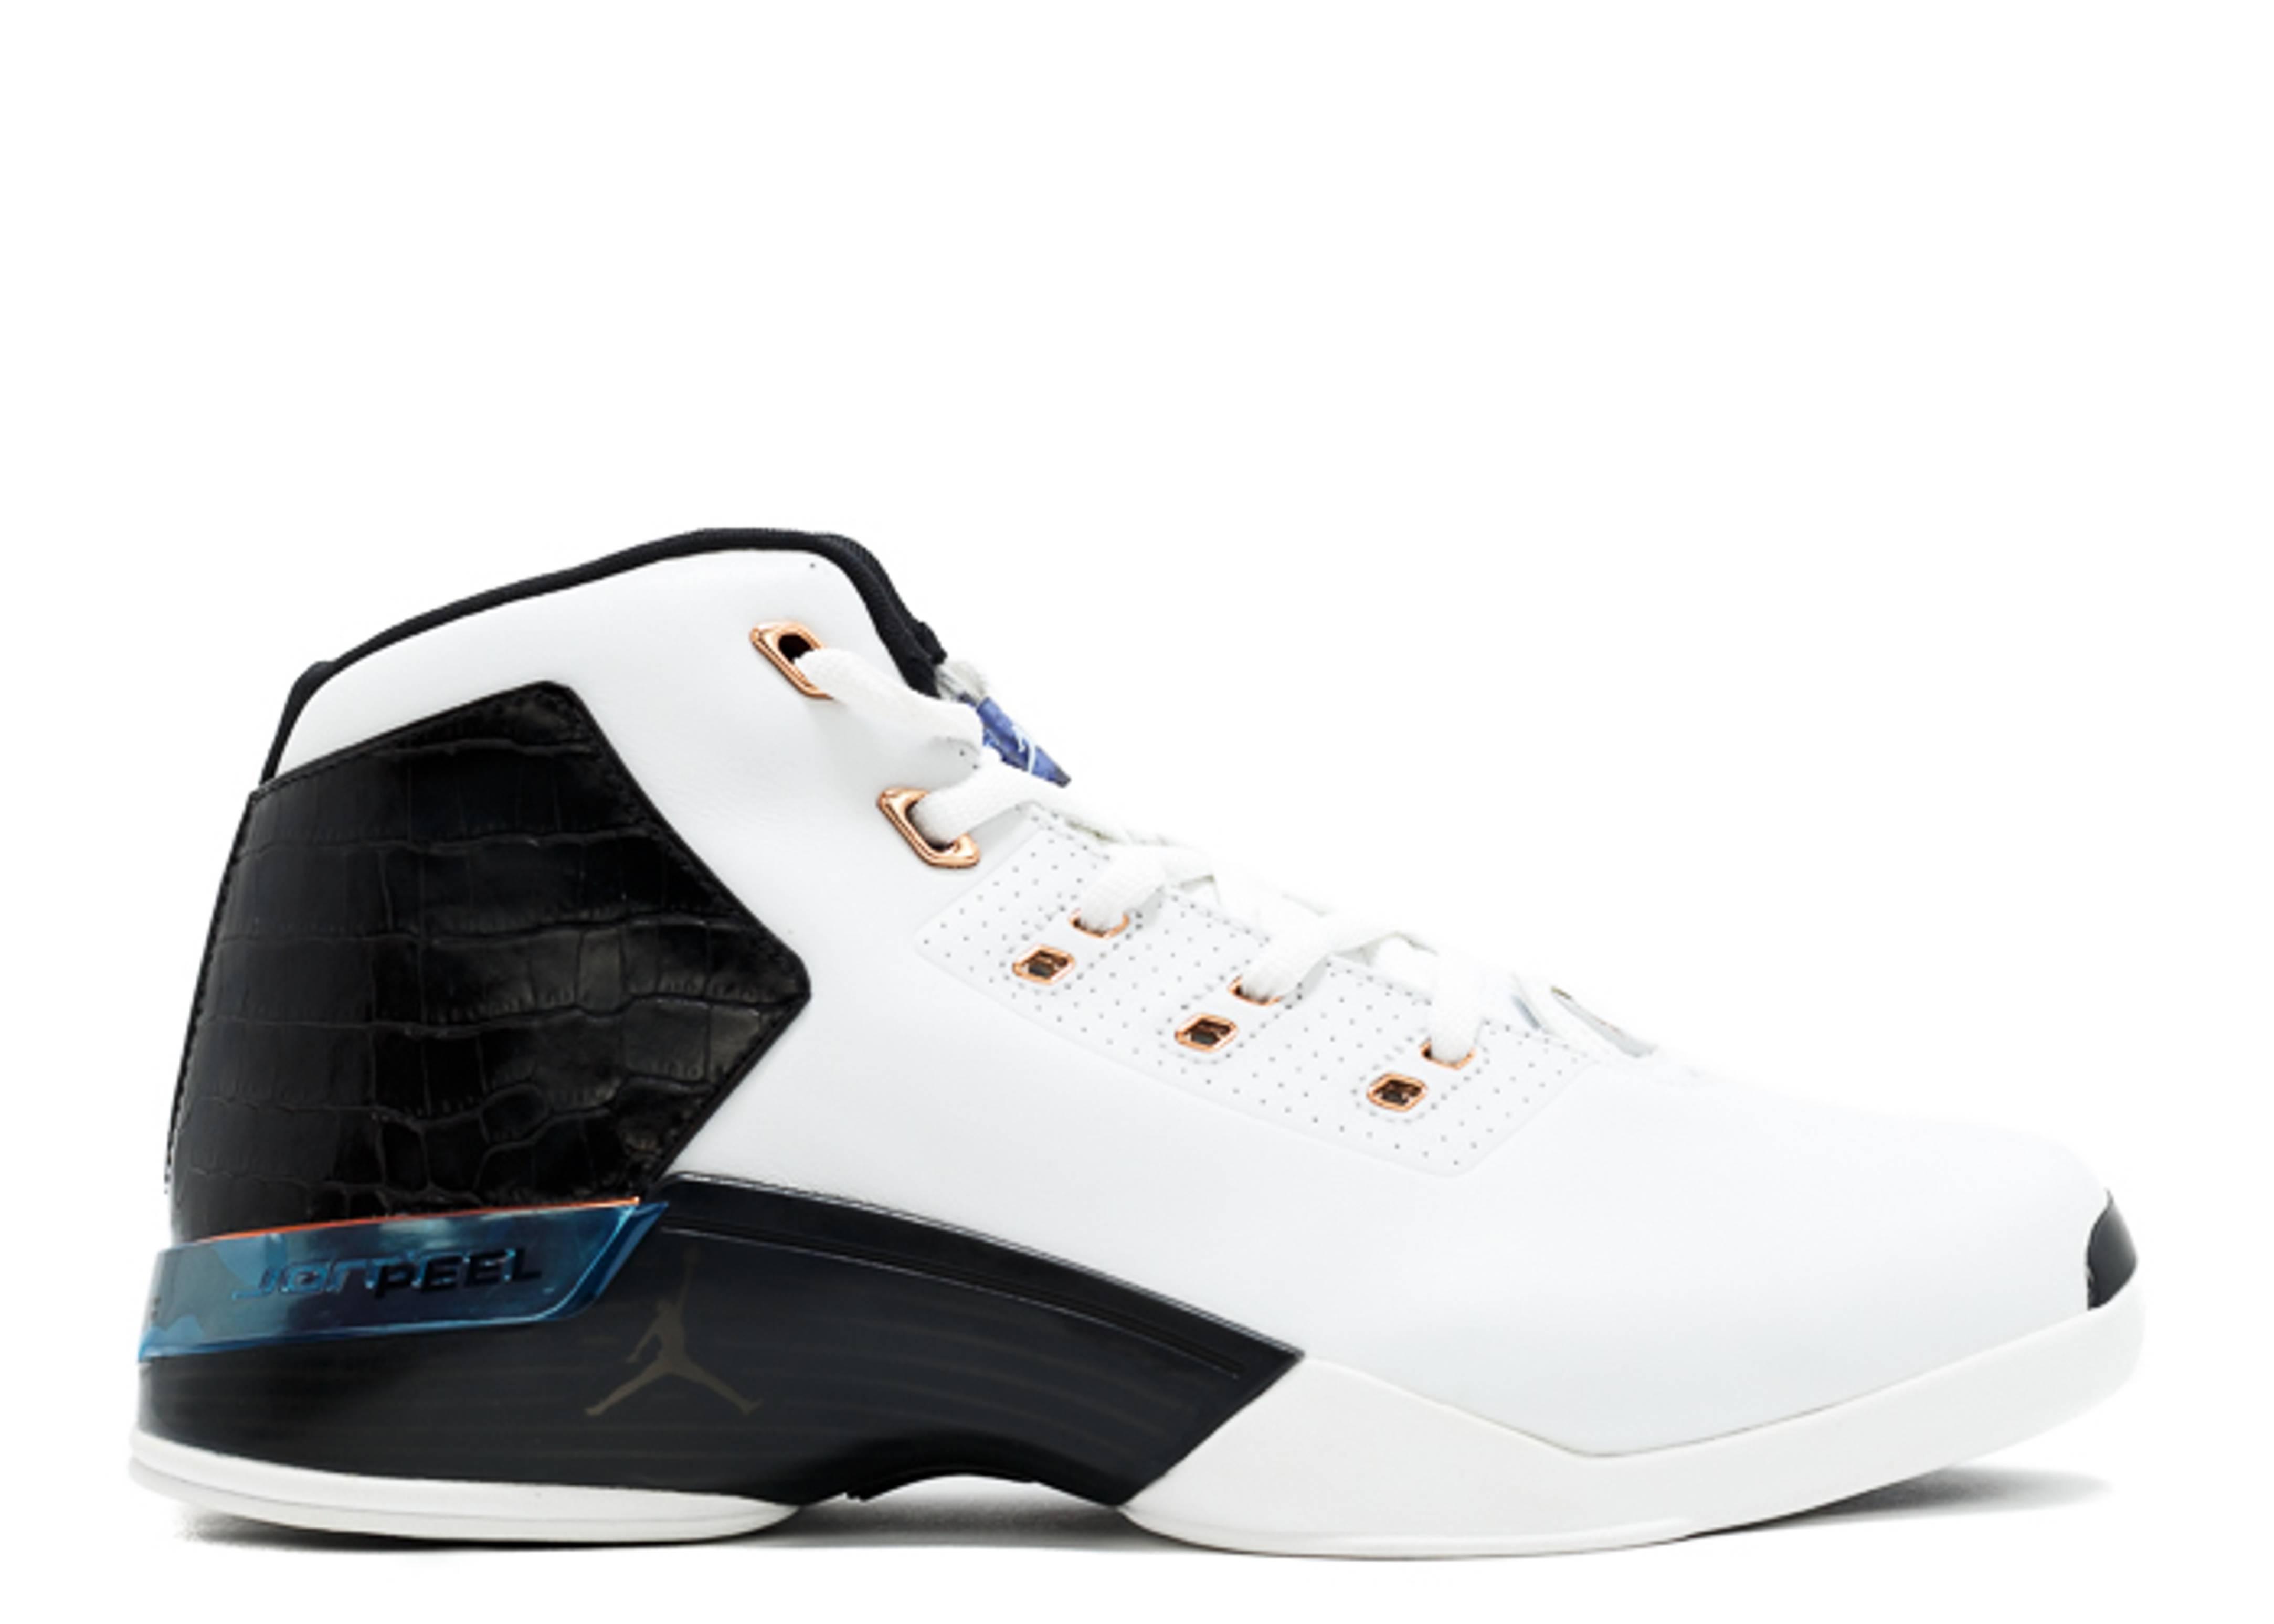 new style 4d234 787bf Air Jordan 17 (XVII) Shoes - Nike   Flight Club